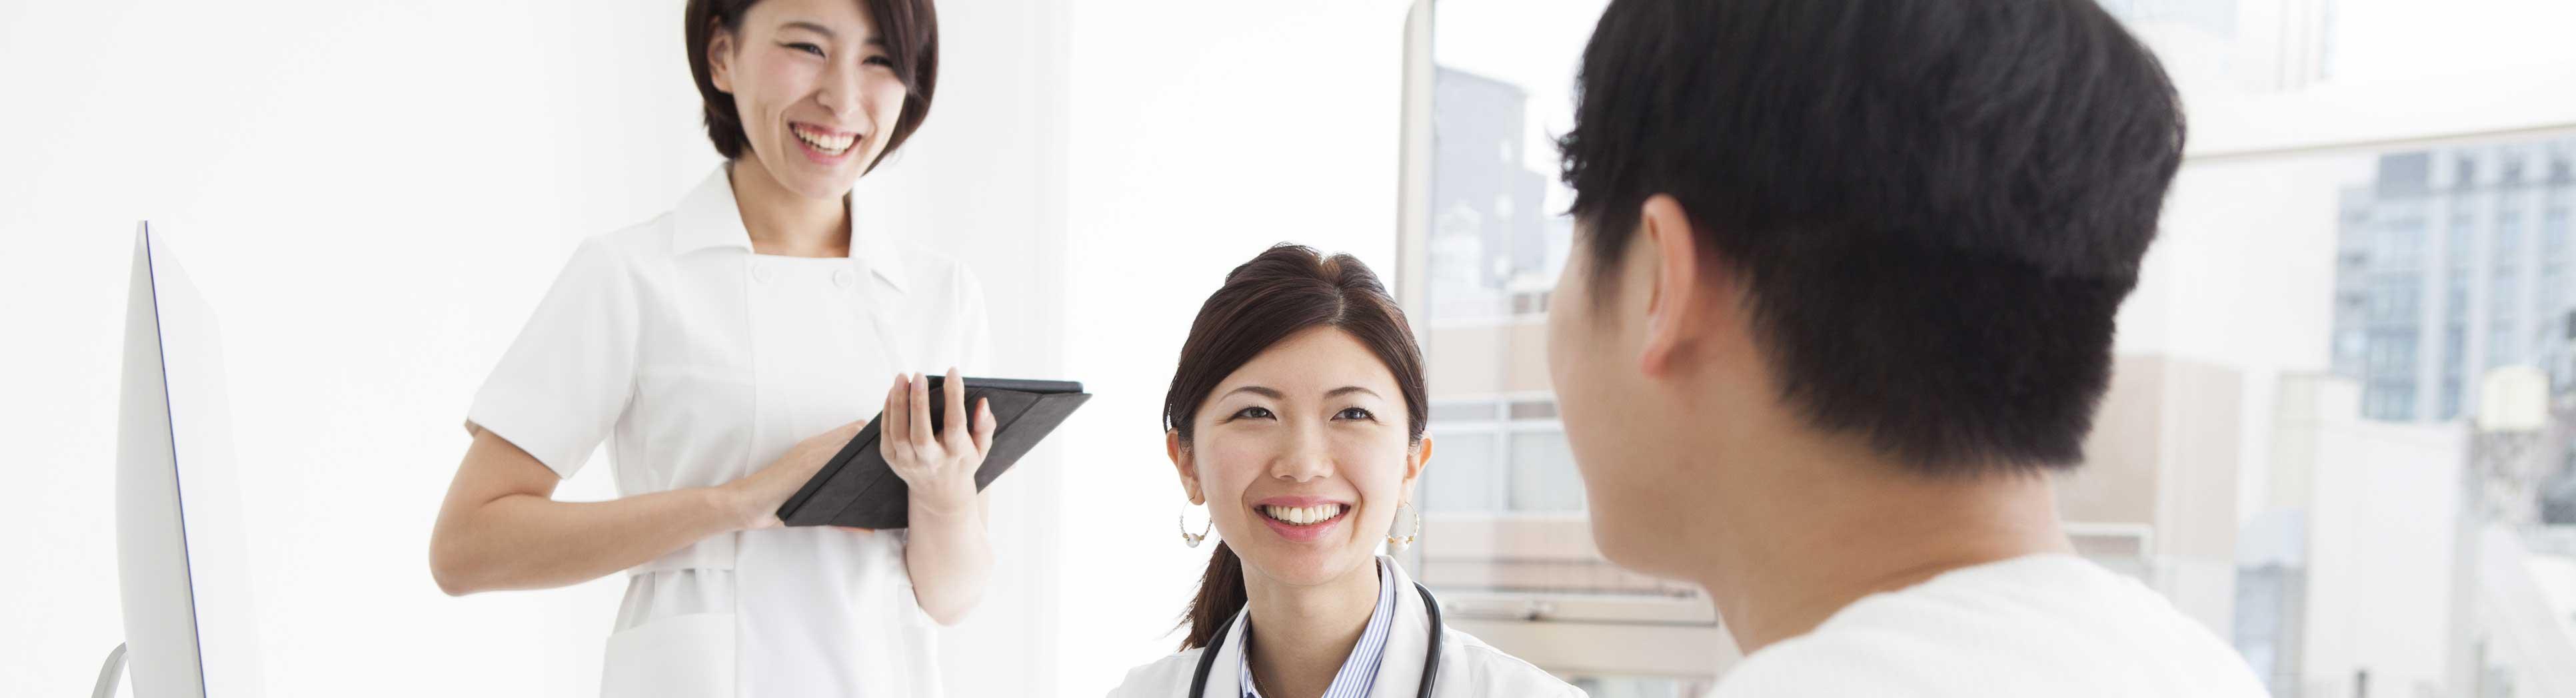 Comprehensive Health Screening - Dr. Health